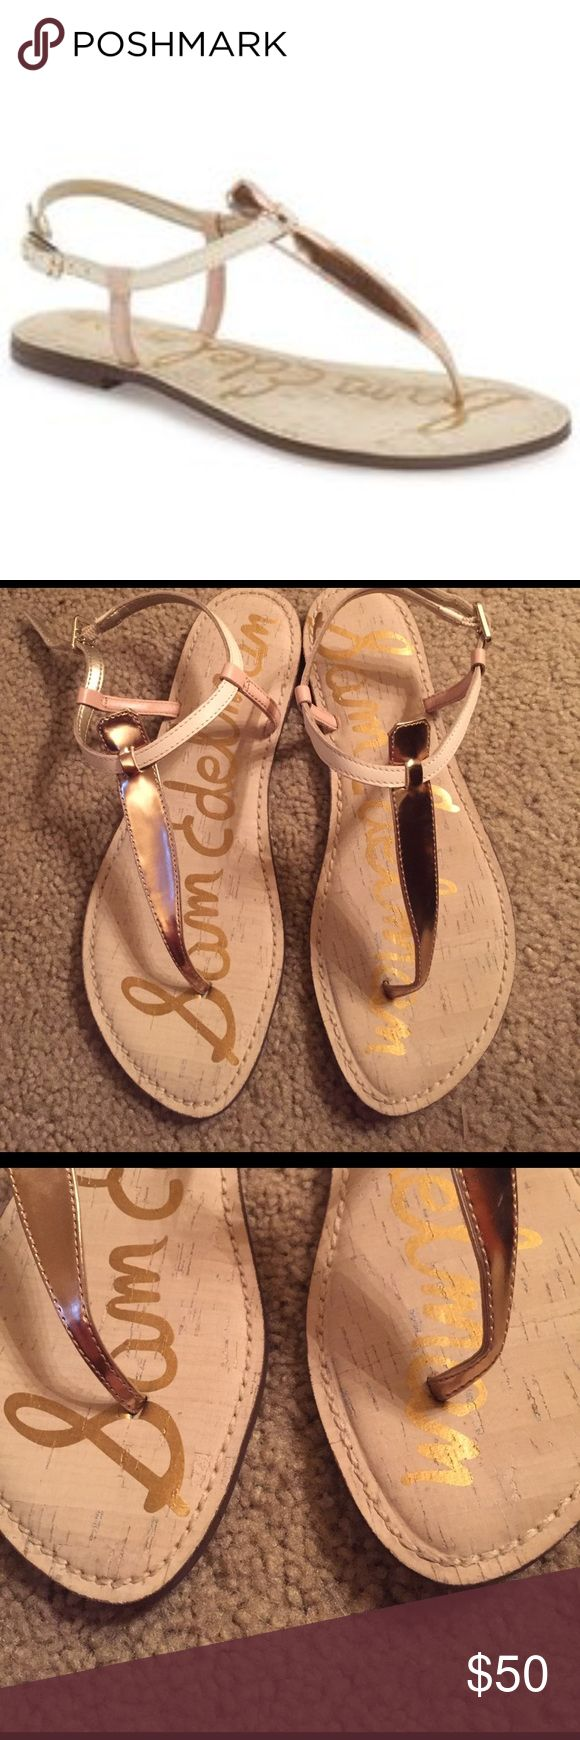 Sam Edelman Gigi size 8.5 Seashell with light pink. Worn once. Very comfortable Sam Edelman Shoes Sandals